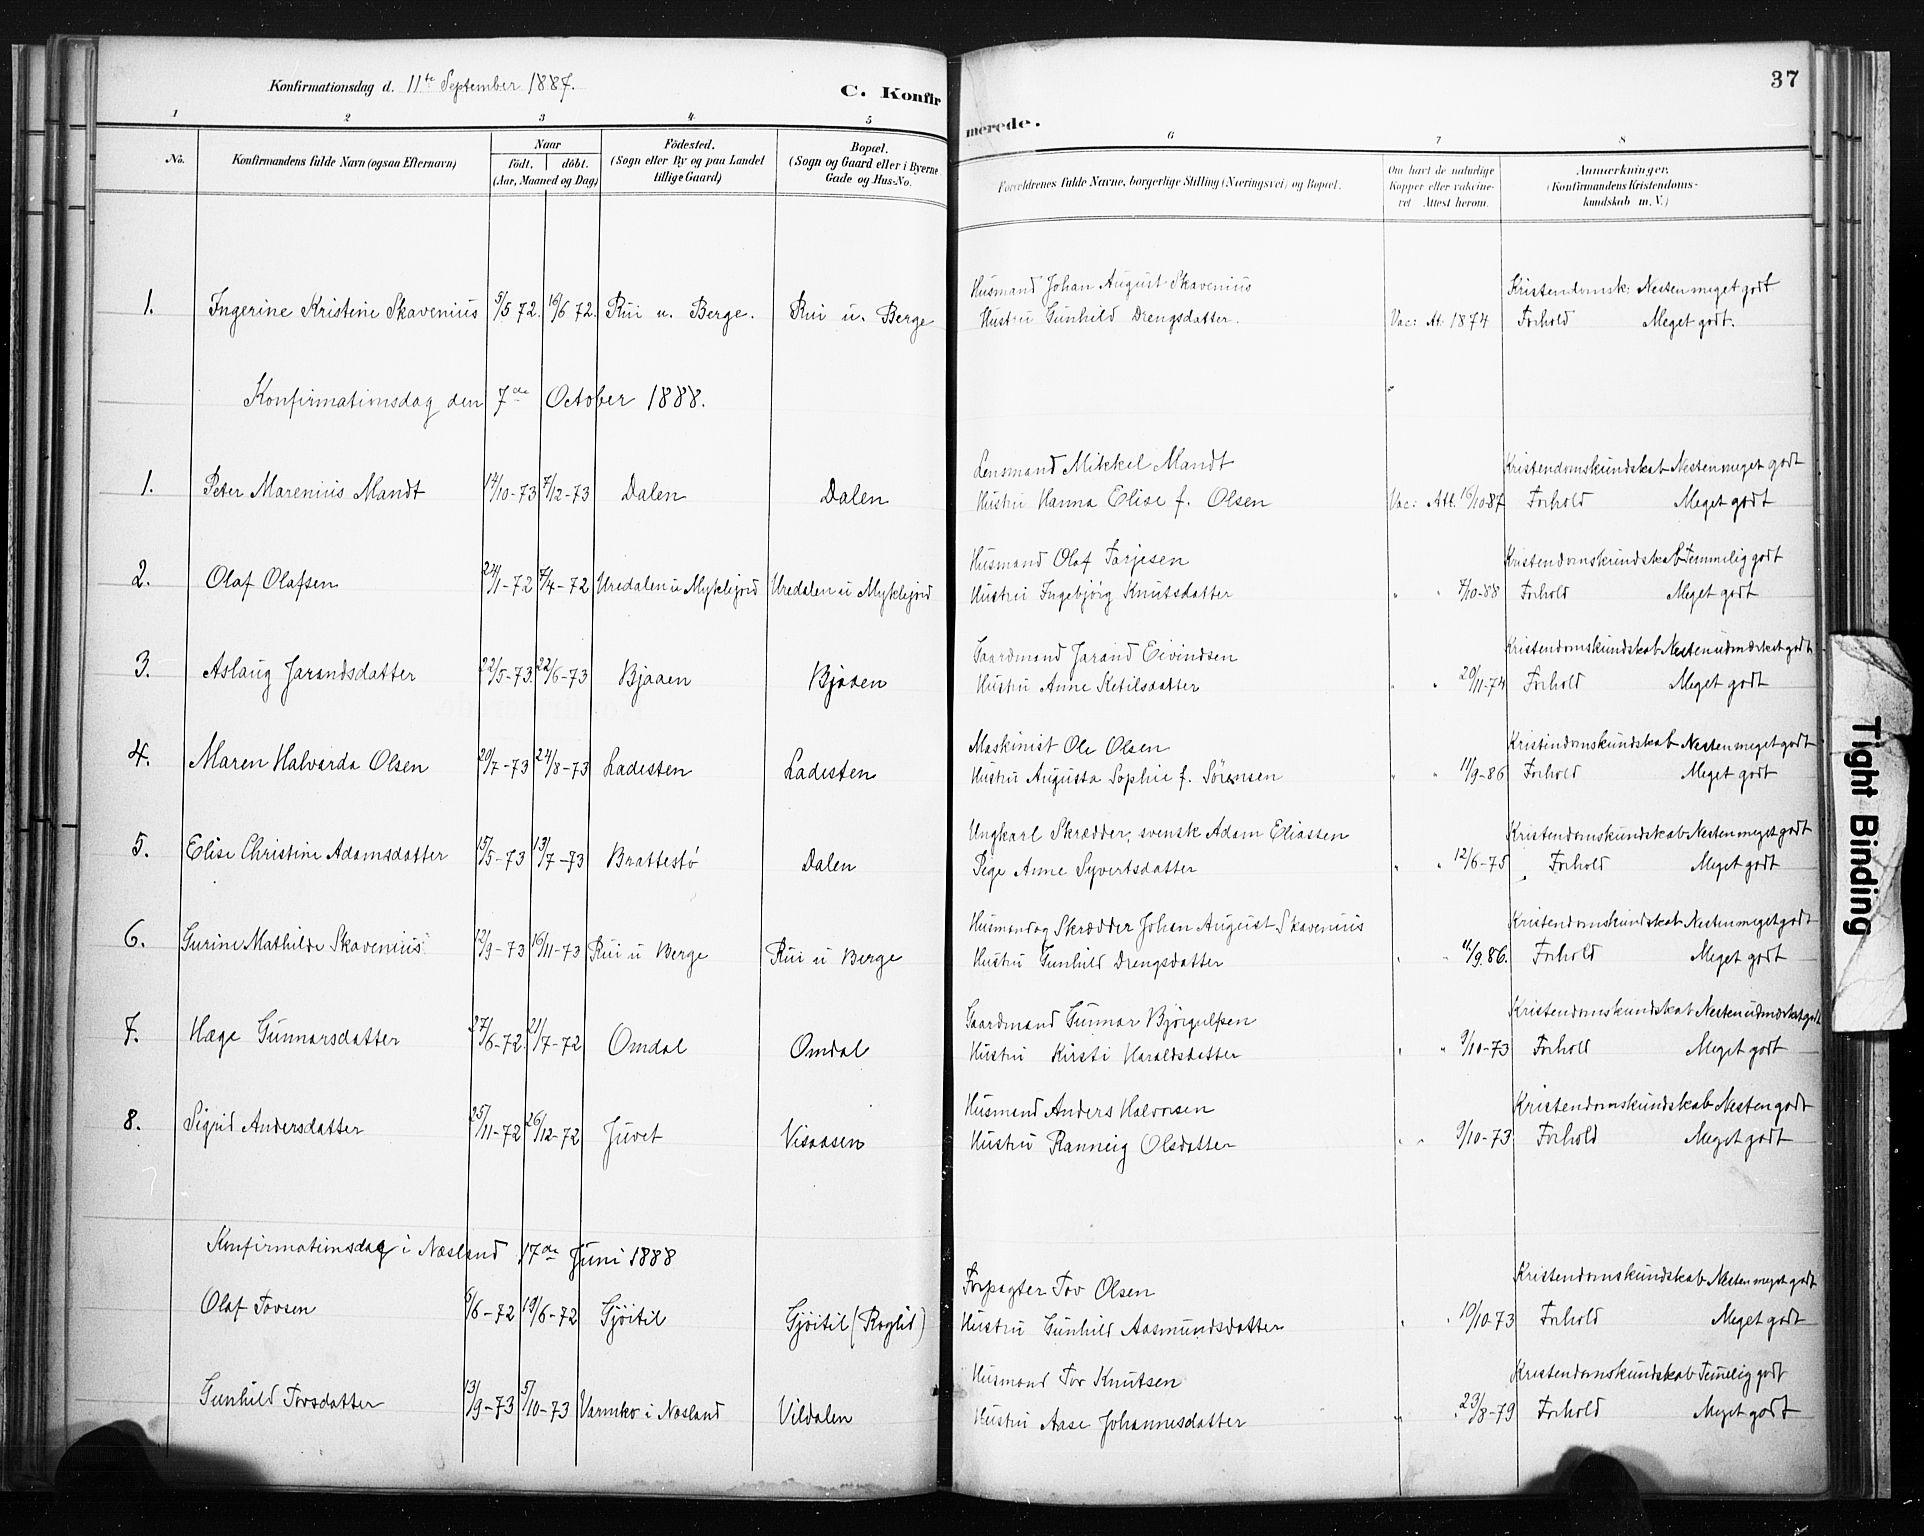 SAKO, Lårdal kirkebøker, F/Fb/L0002: Ministerialbok nr. II 2, 1887-1918, s. 37